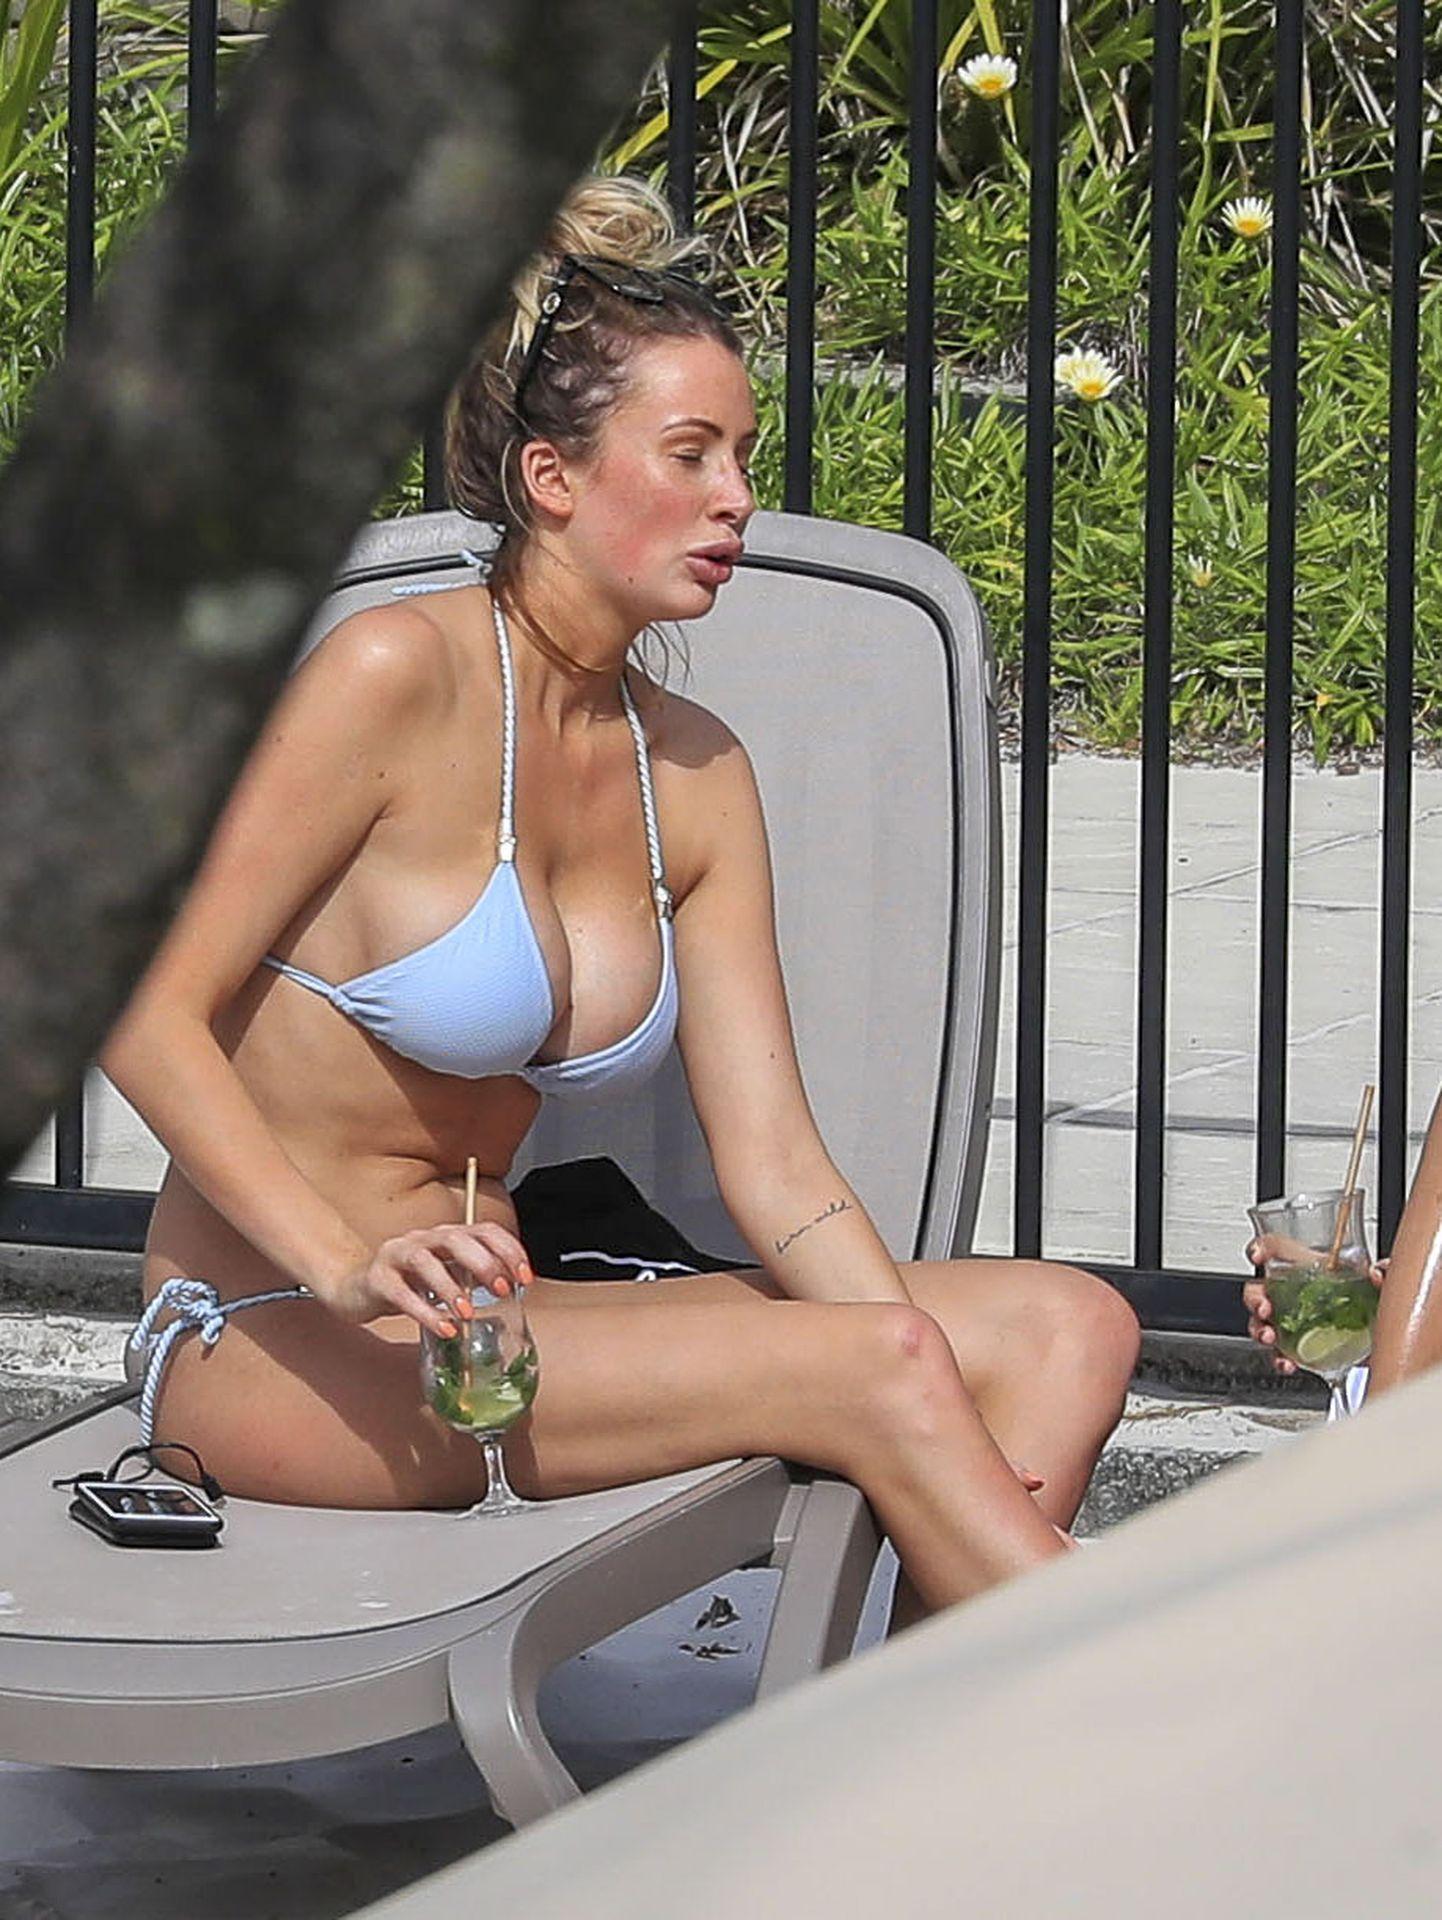 Megan McKenna & Olivia Attwood Sexy (54 Photos) 42